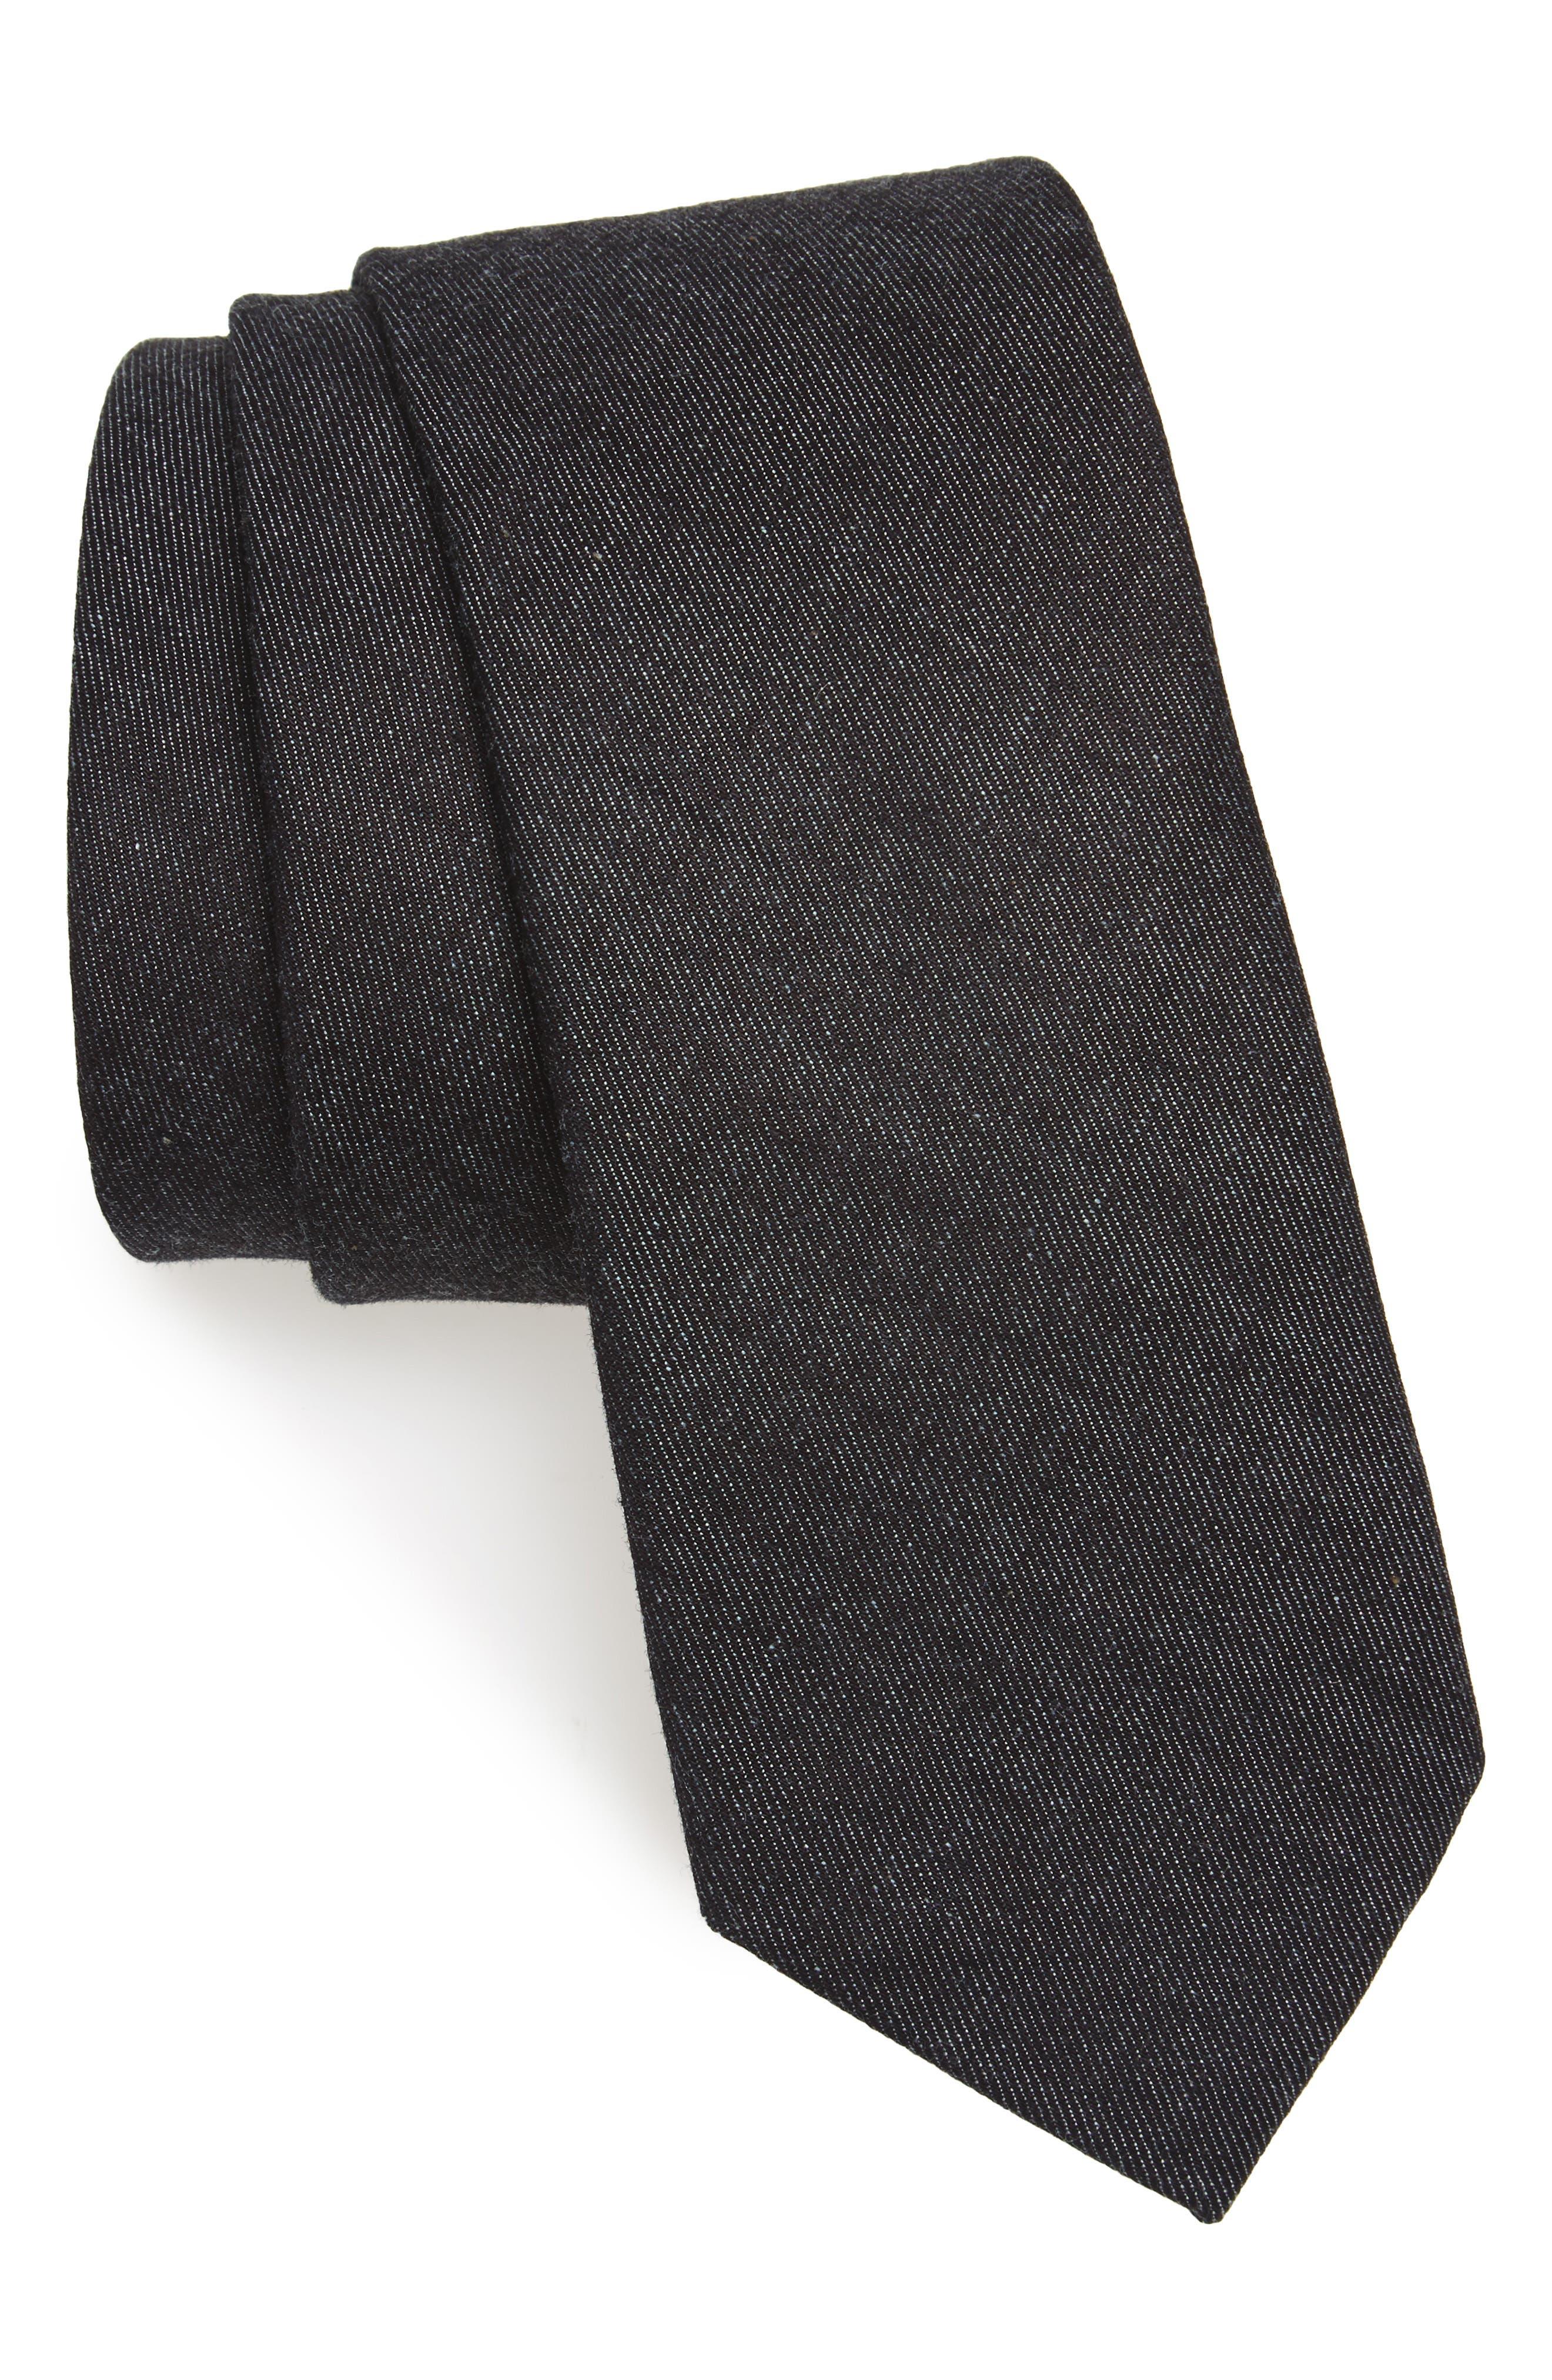 Main Image - 1901 Bartlett Solid Cotton Tie